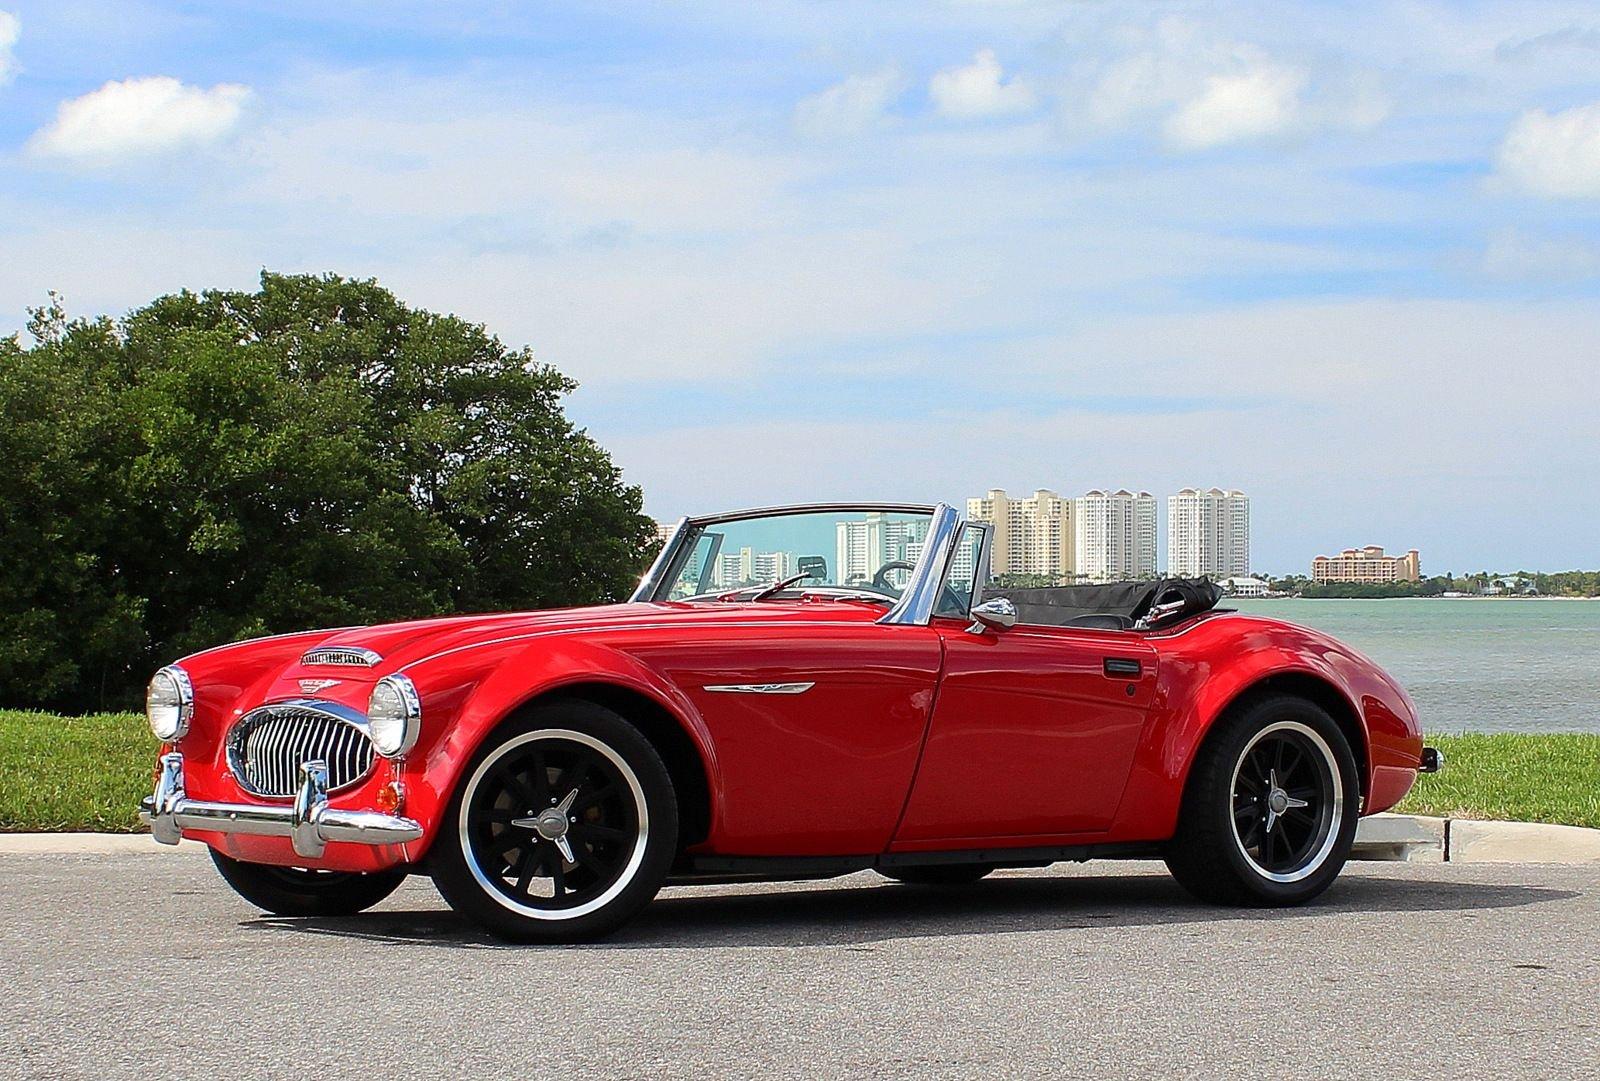 1960 austin healey 3000 replica